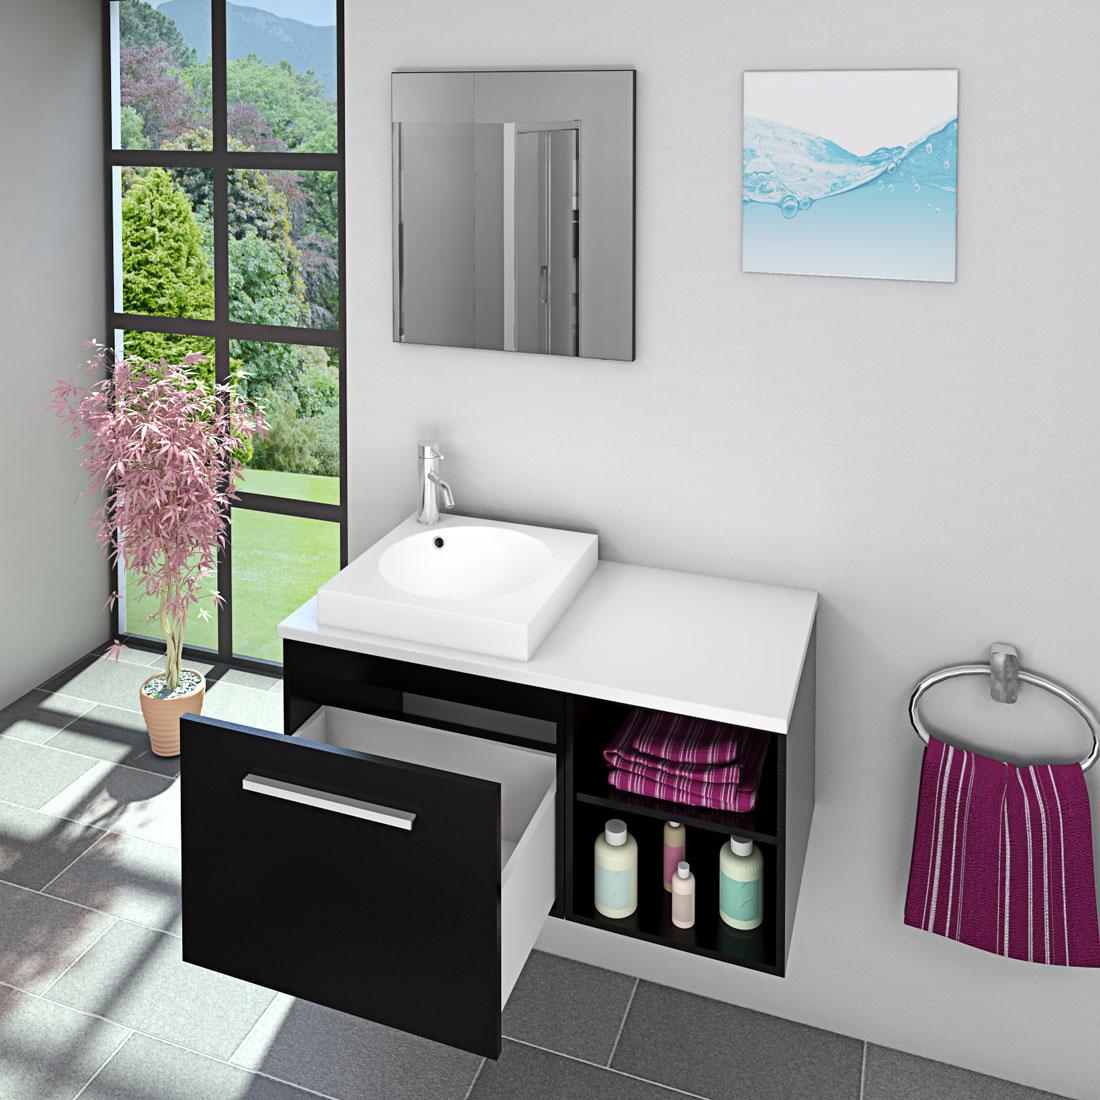 badm bel set city 202 v1 esche schwarz badezimmerm bel waschtisch 100cm. Black Bedroom Furniture Sets. Home Design Ideas